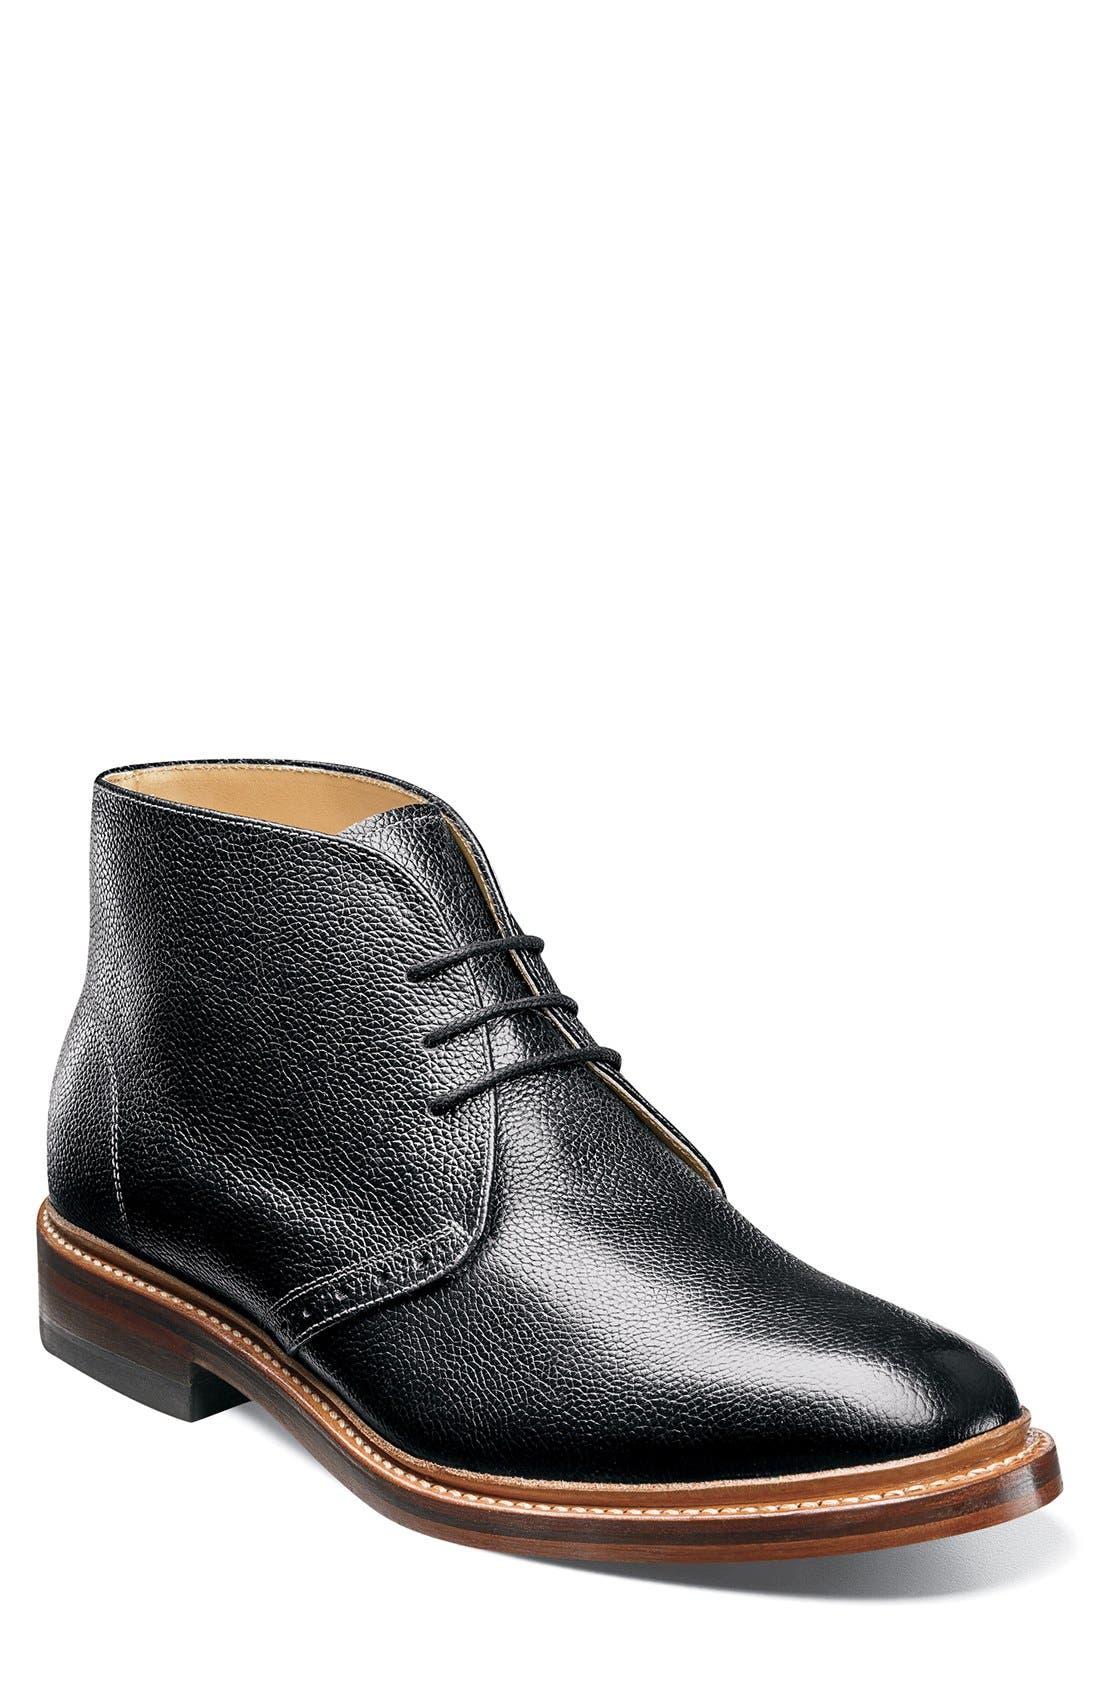 'Madison II' Chukka Boot,                         Main,                         color, 001